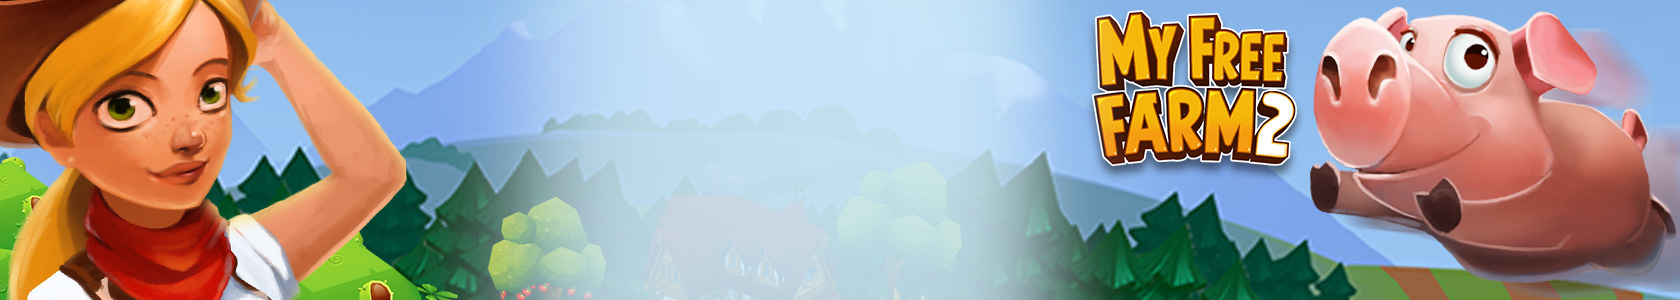 The farming game: My Free Farm 2